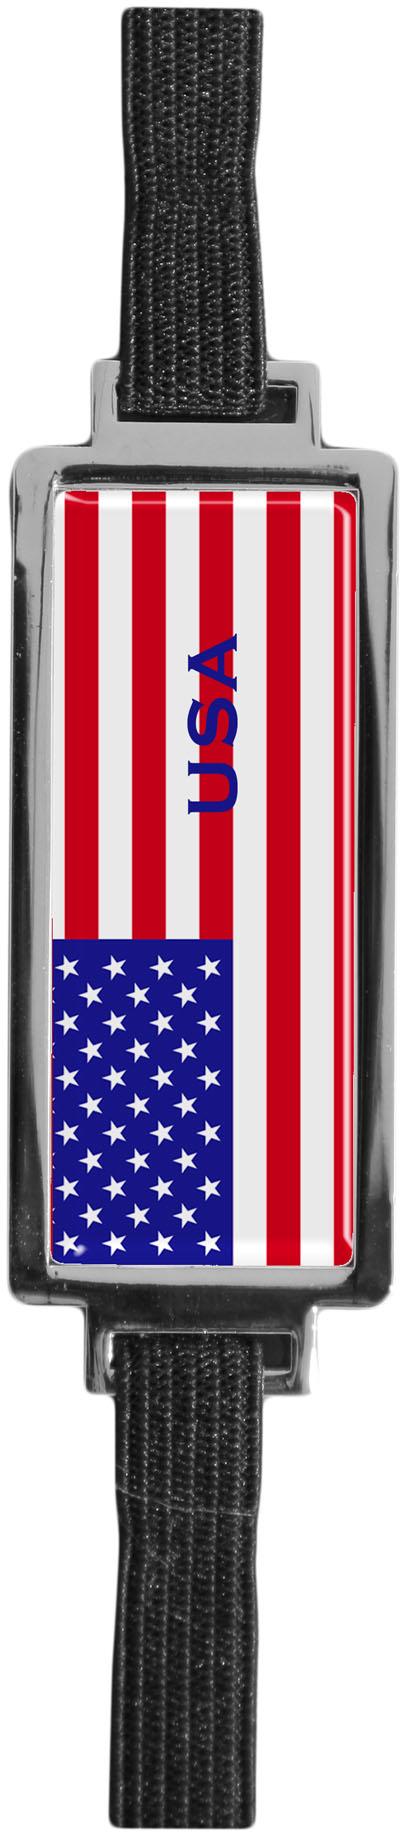 "Metall - Lesezeichen  ""USA"""